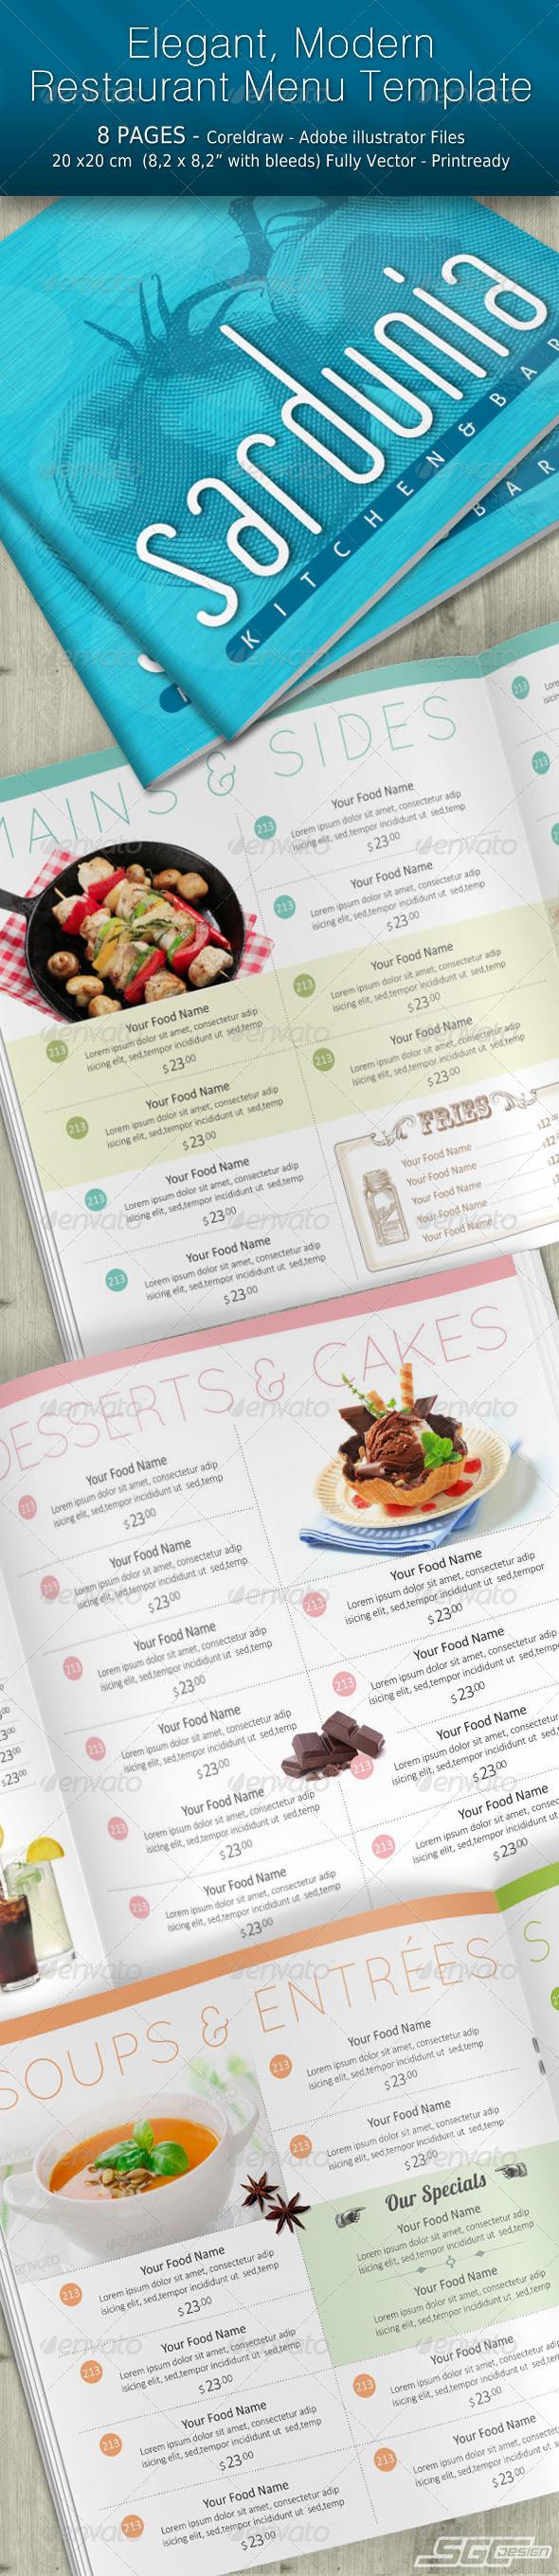 GraphicRiver Modern Elegant Restaurant Menu 6495610